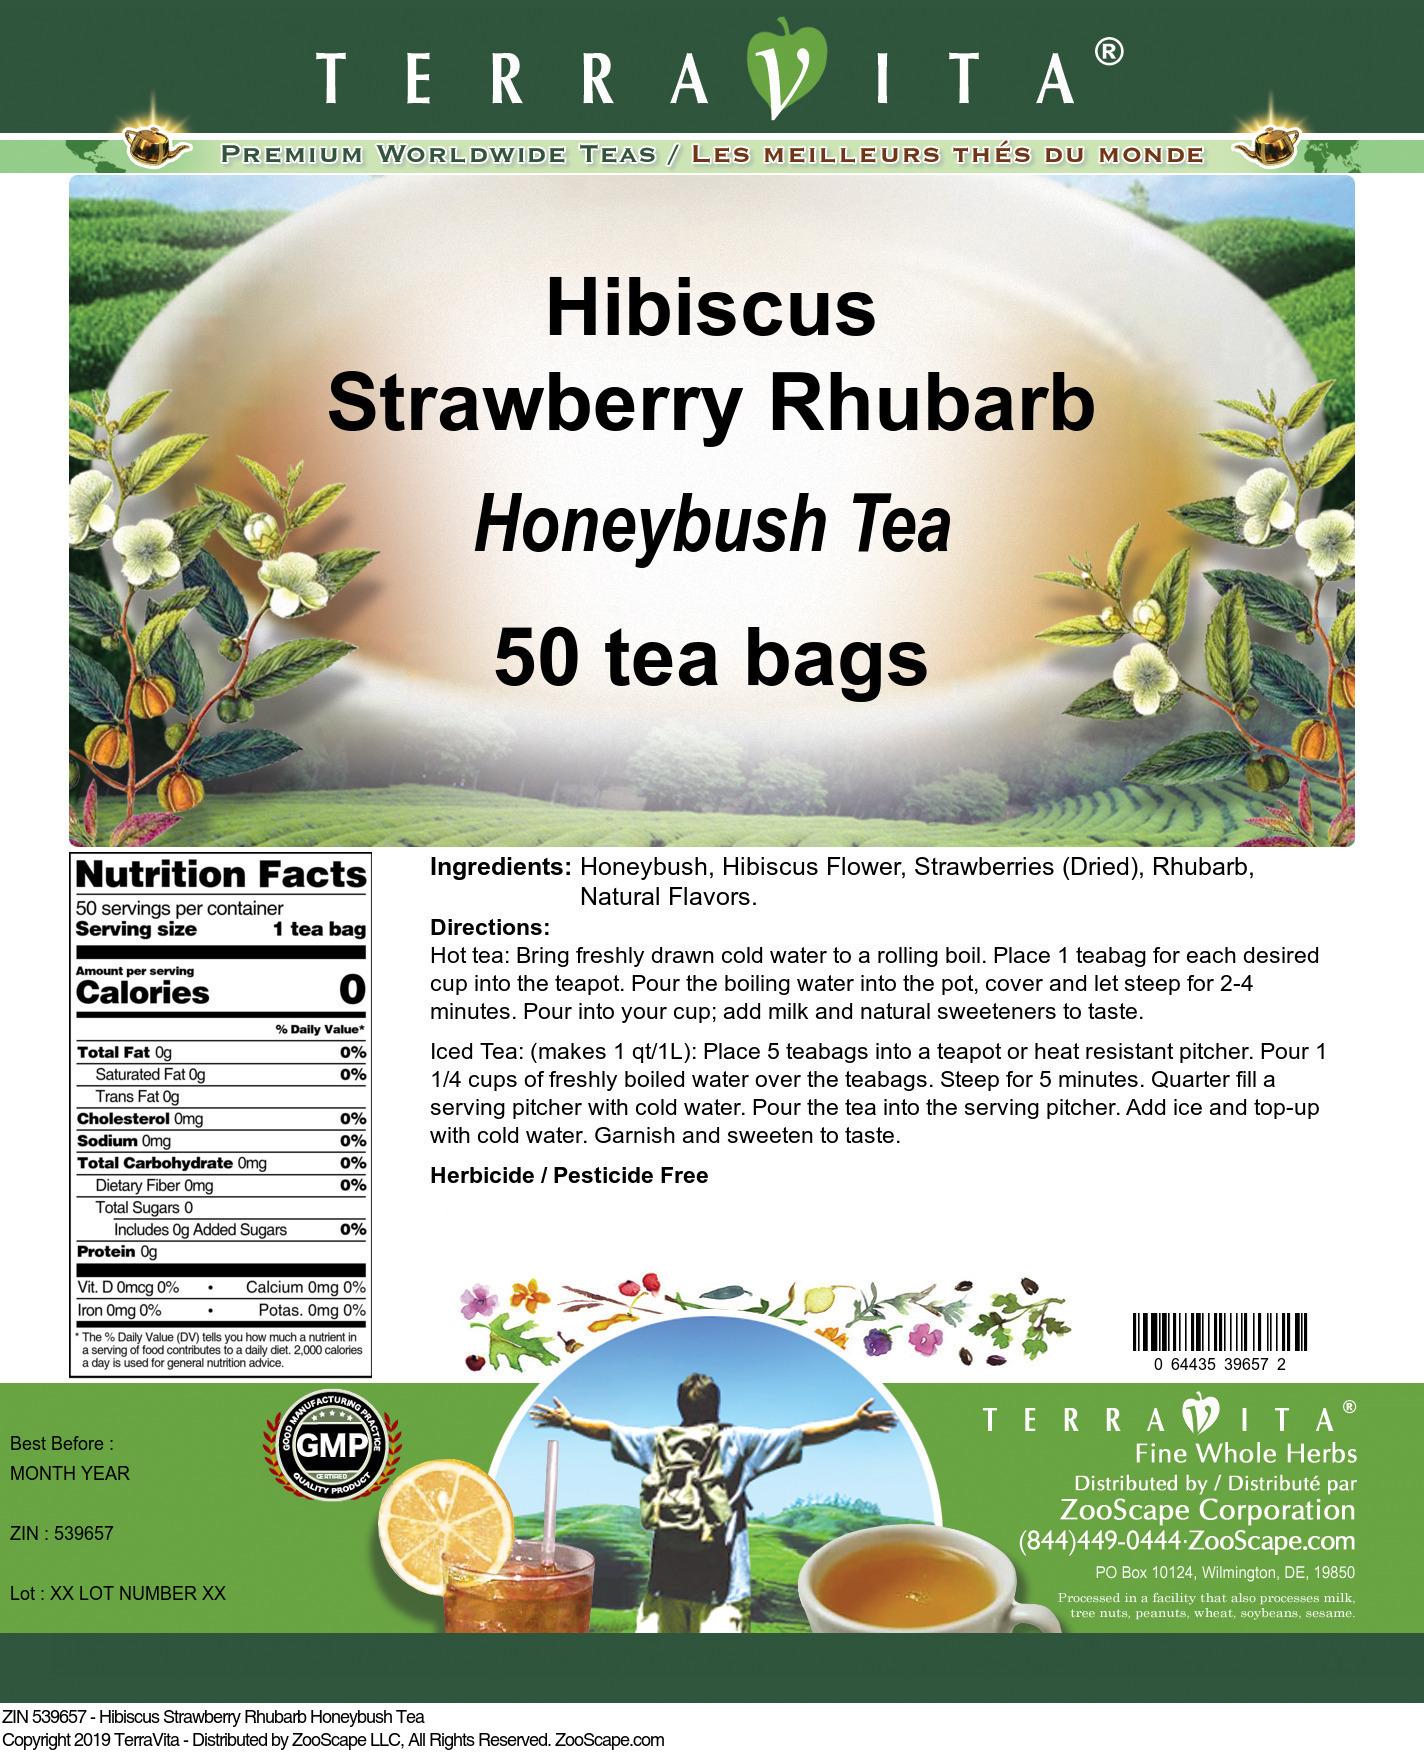 Hibiscus Strawberry Rhubarb Honeybush Tea